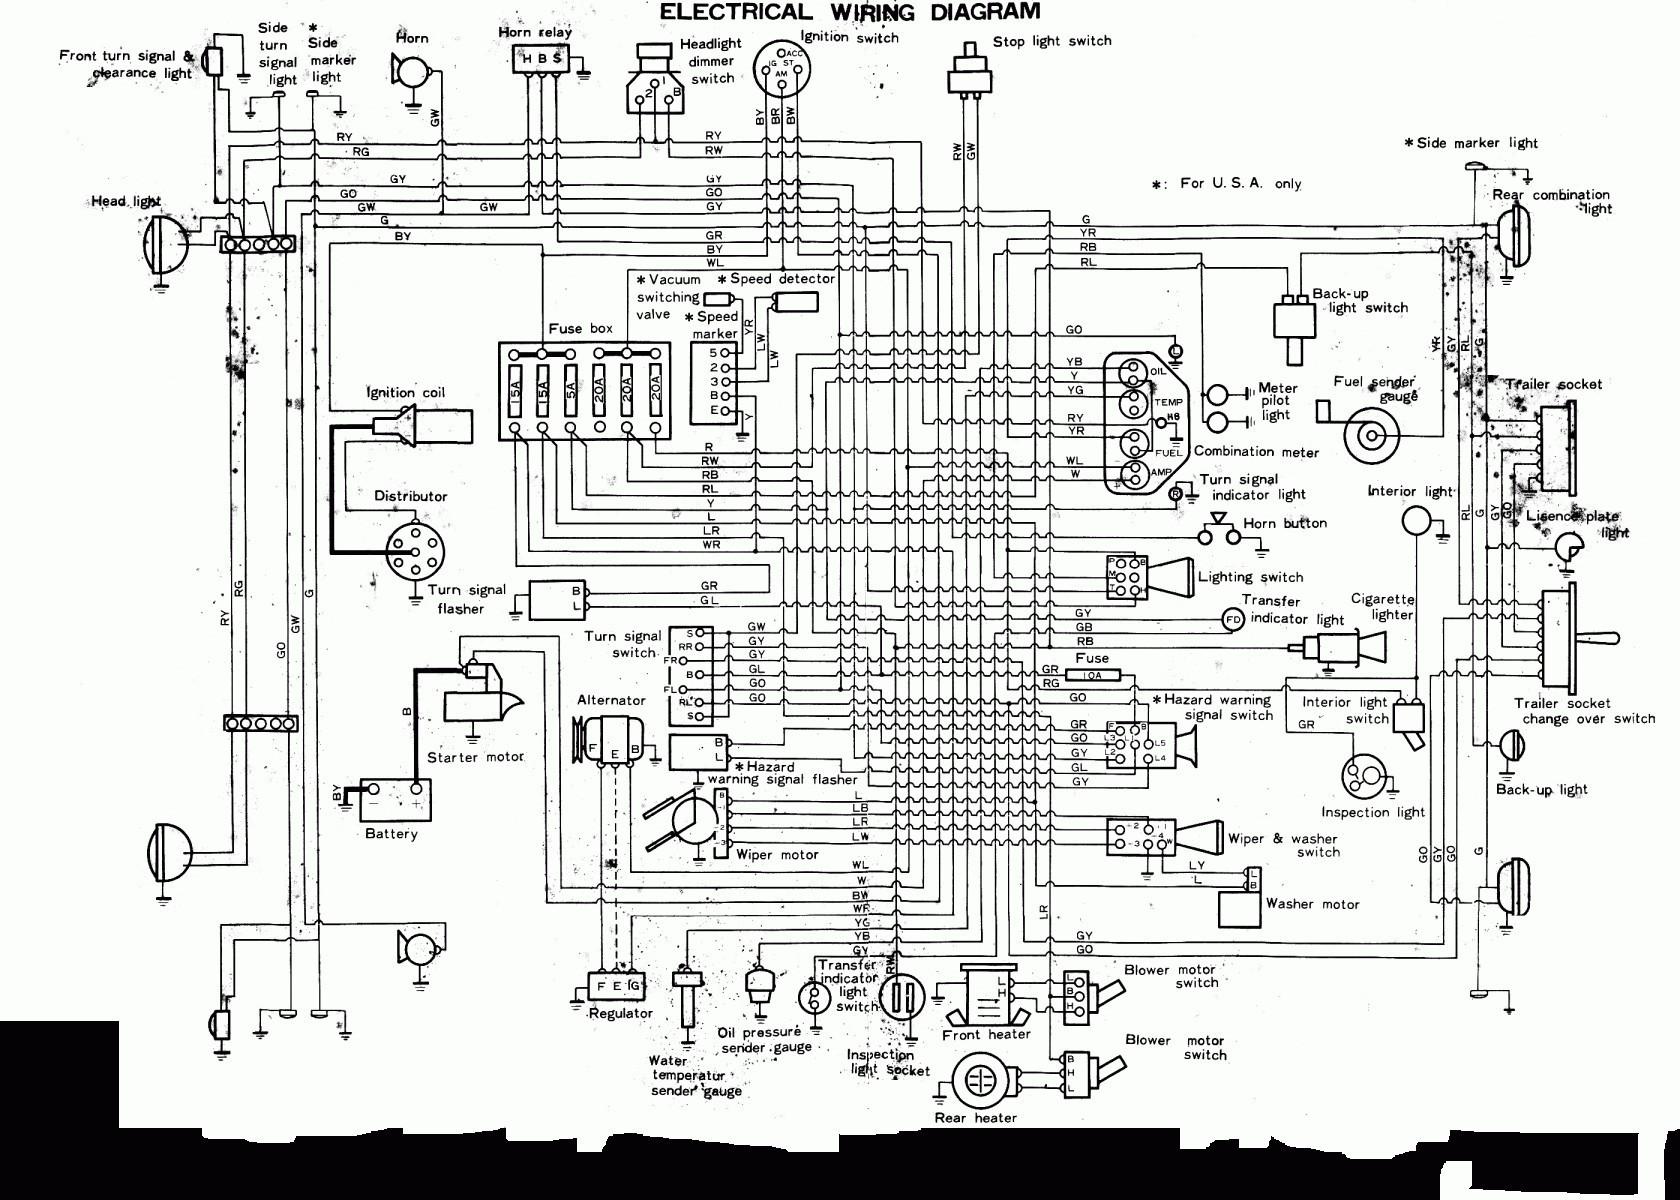 toyota fujitsu ten wiring diagram inspirational toyota wiring harness diagram wiring diagram of toyota fujitsu ten wiring diagram